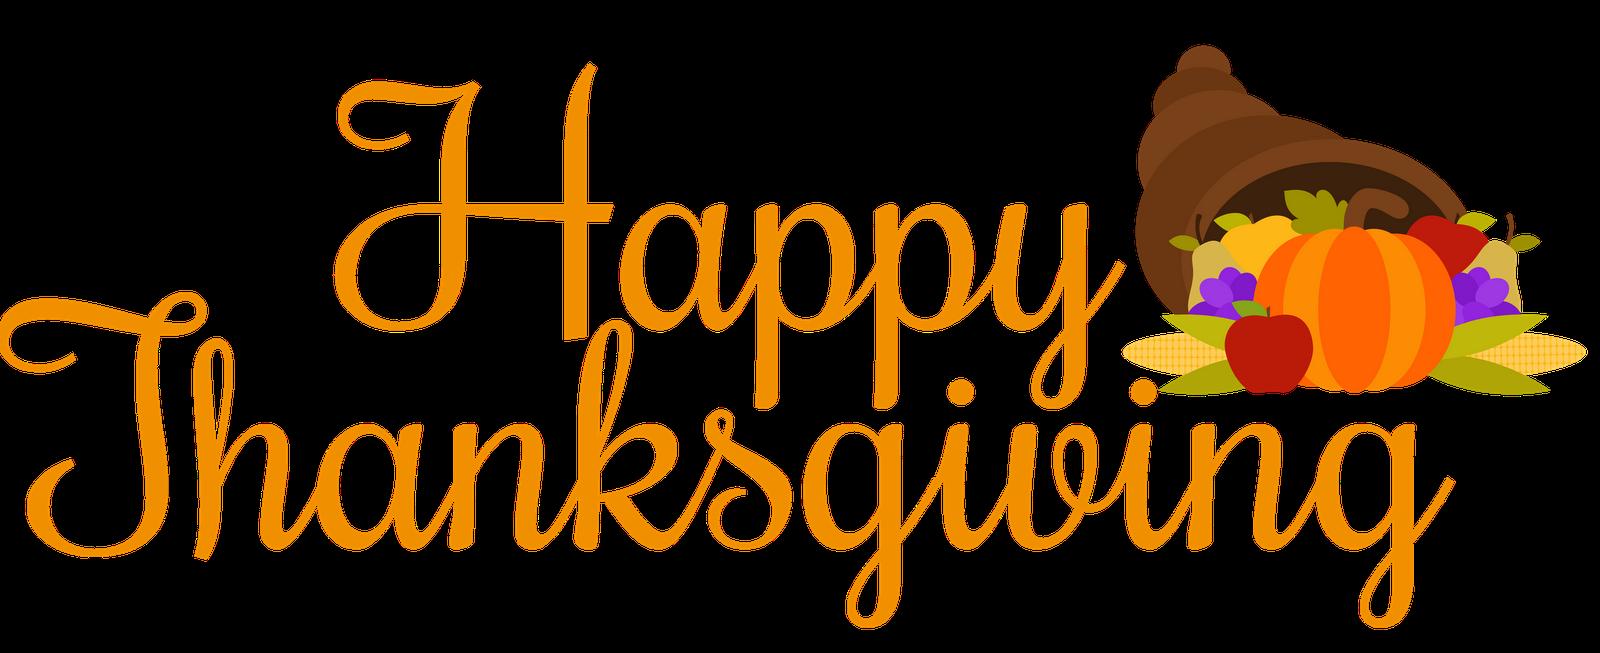 Pilgrims clipart happy. Thanksgiving saturday northshore health